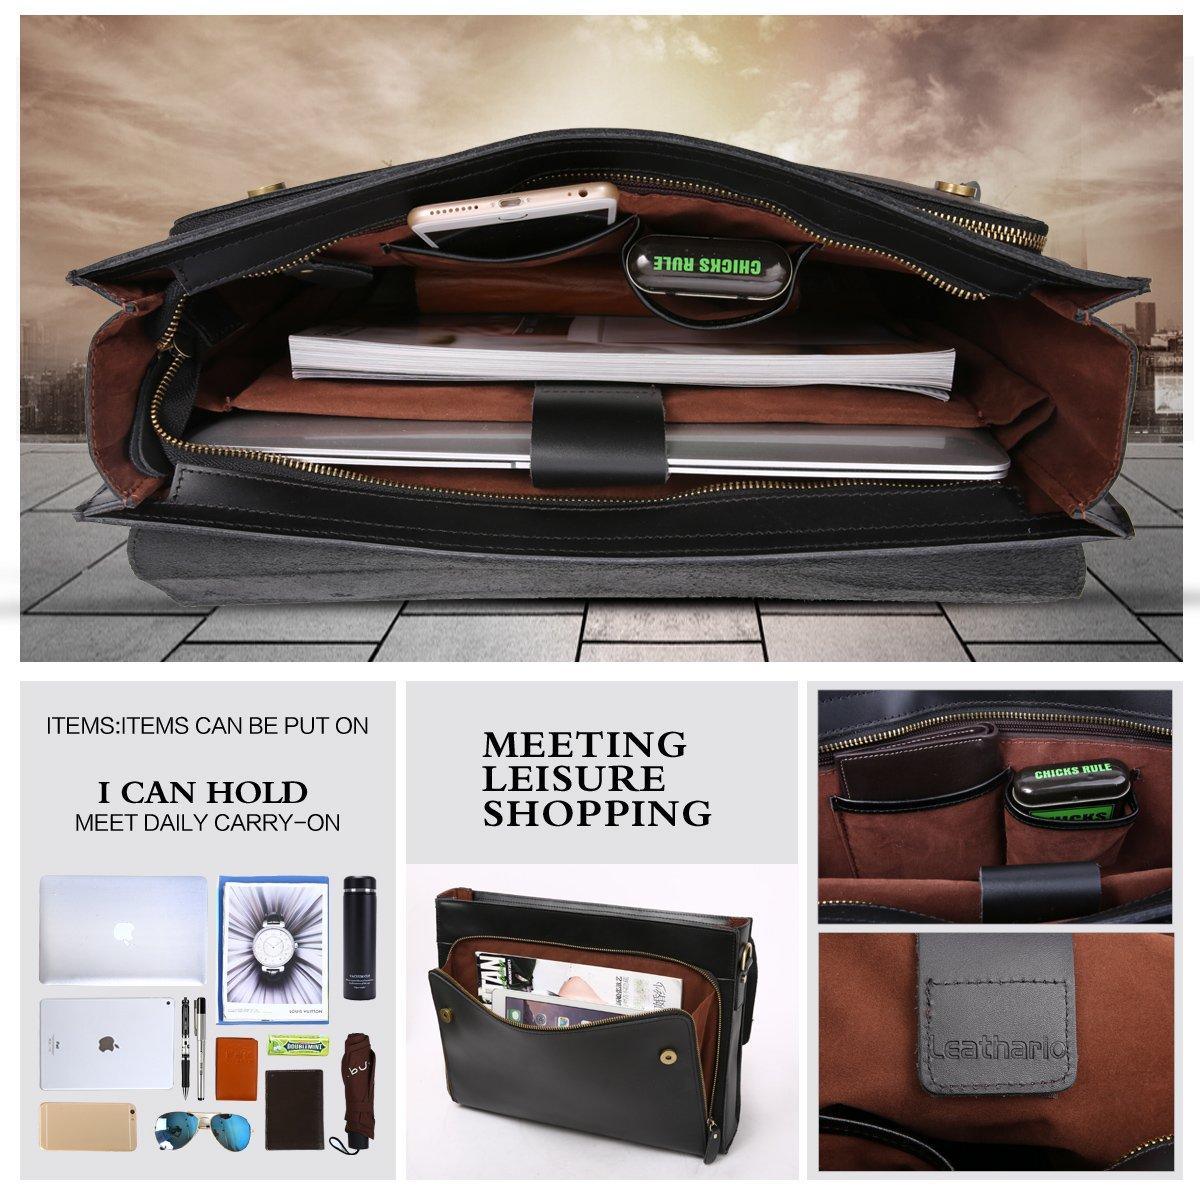 Leathario Leather Briefcase for Men Leather Laptop Bag Shoulder Messenger Bag Business Work Bag by Leathario (Image #3)